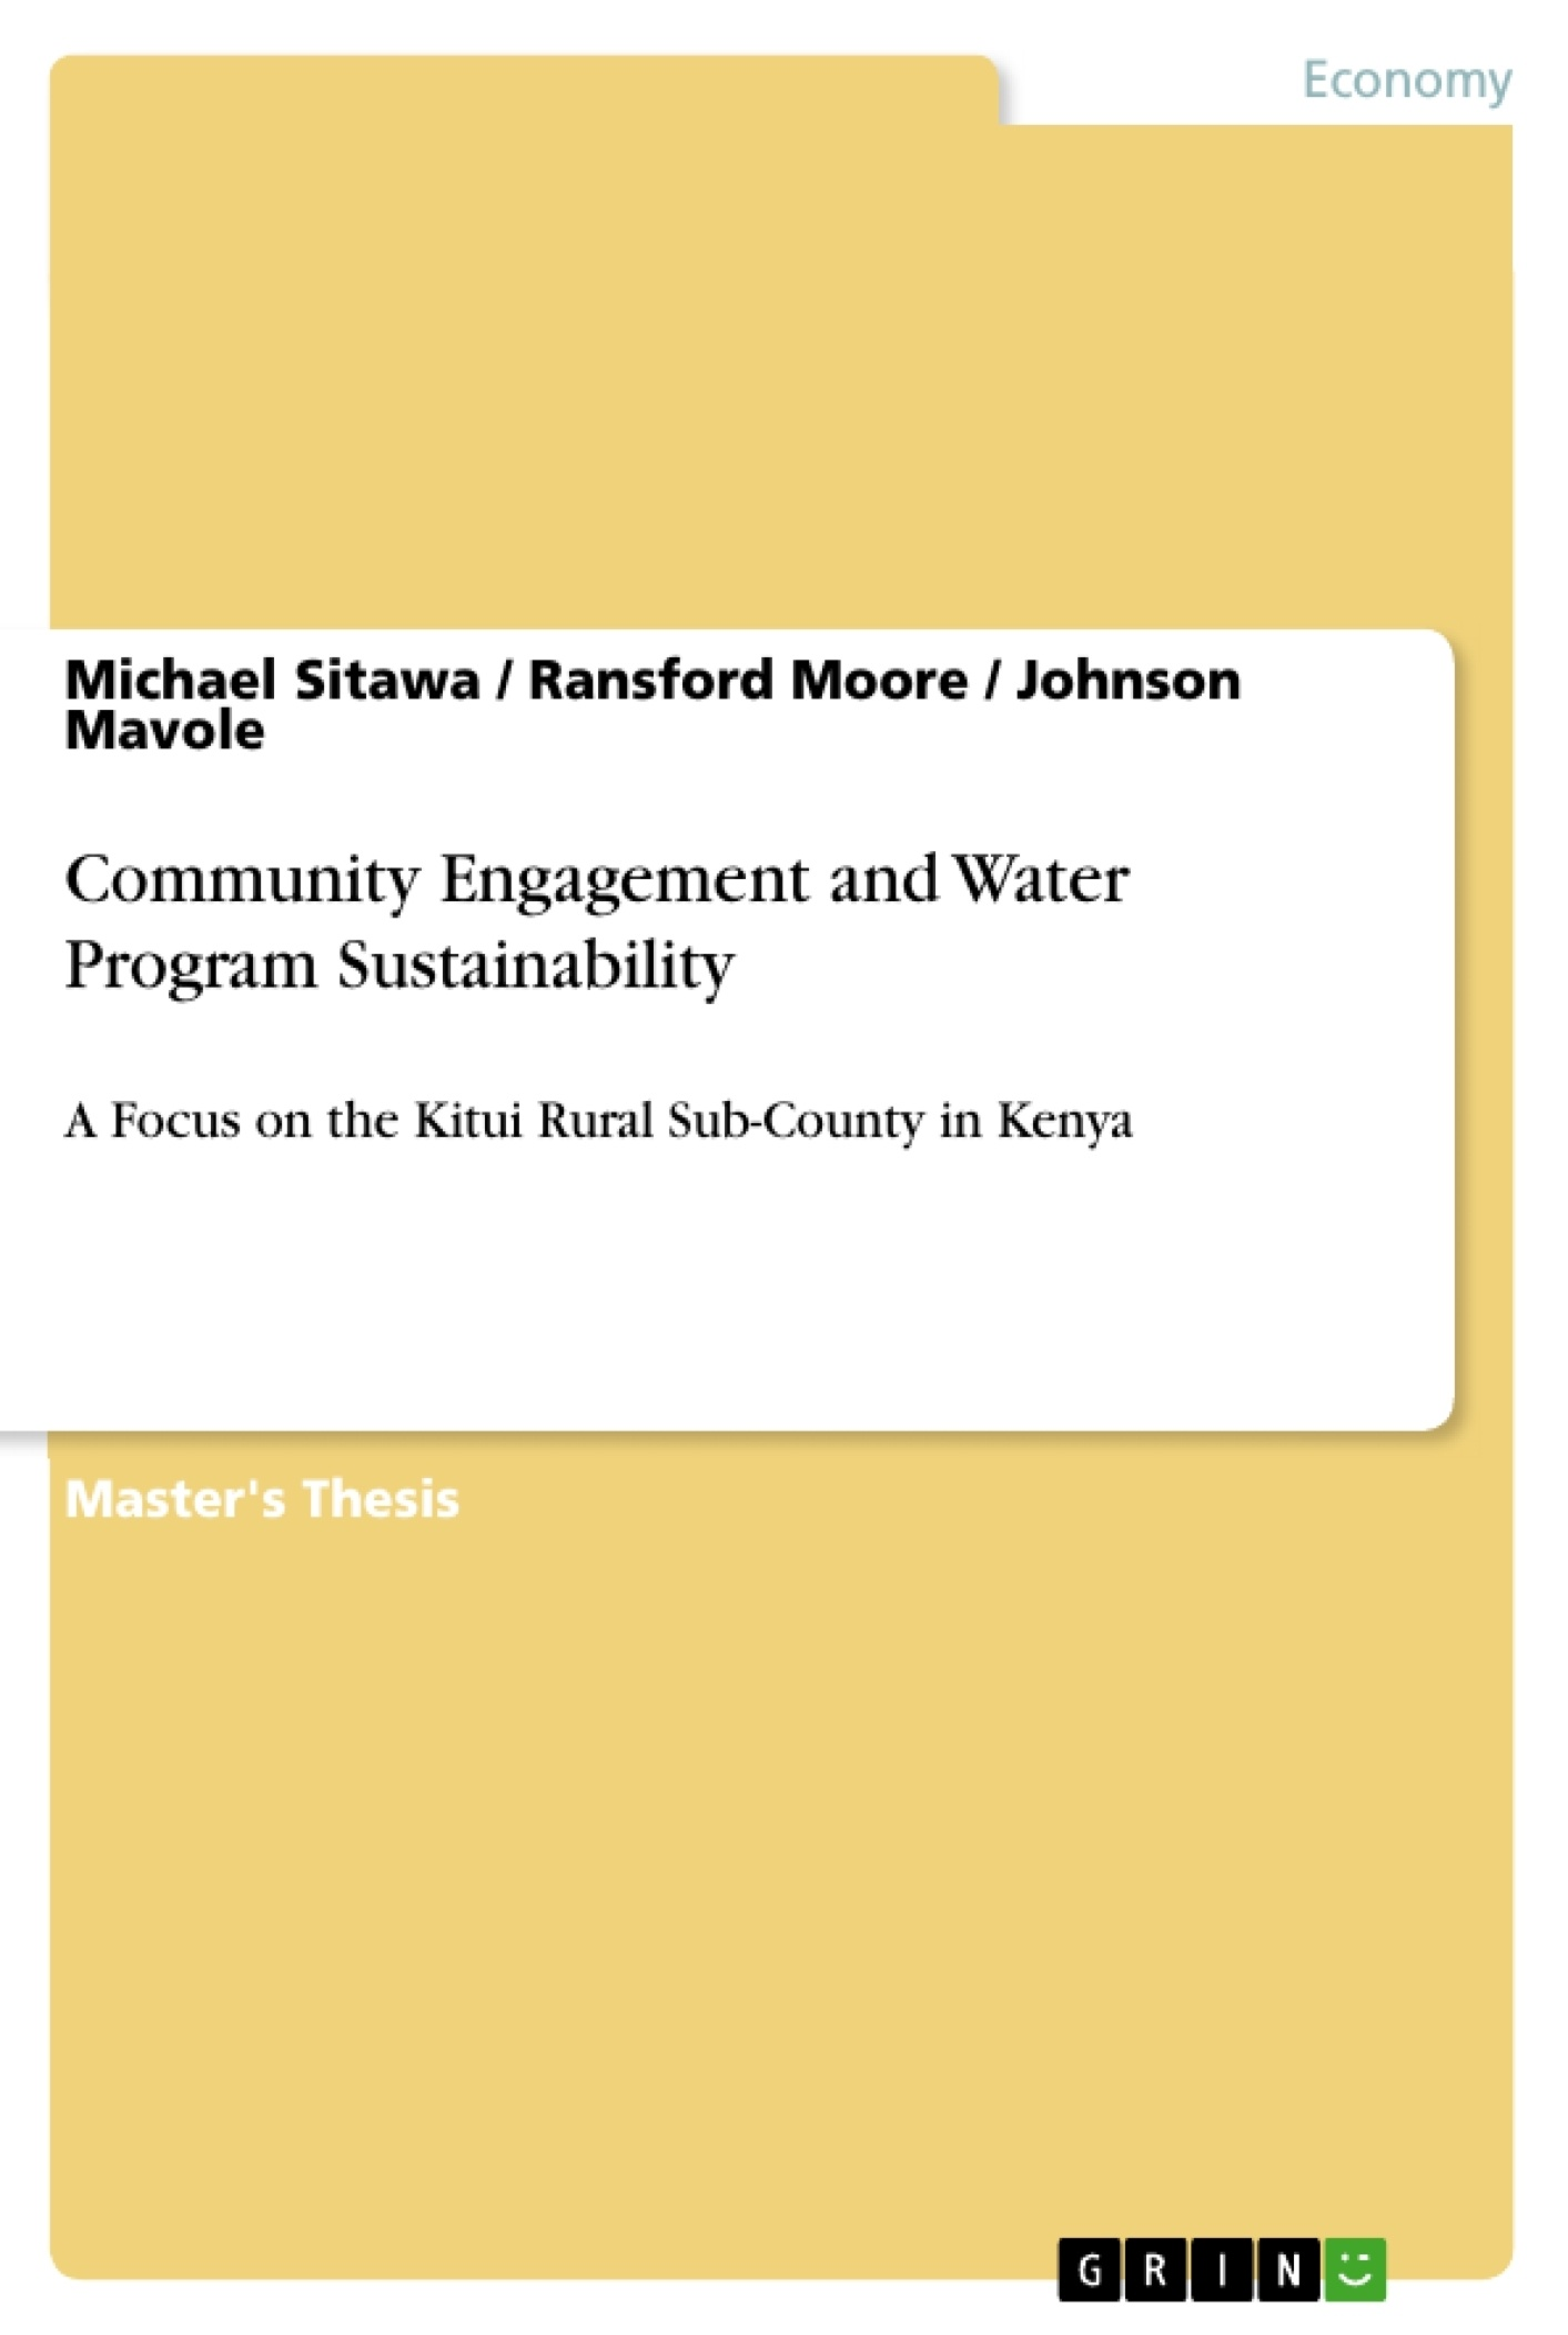 Title: Community Engagement and Water Program Sustainability